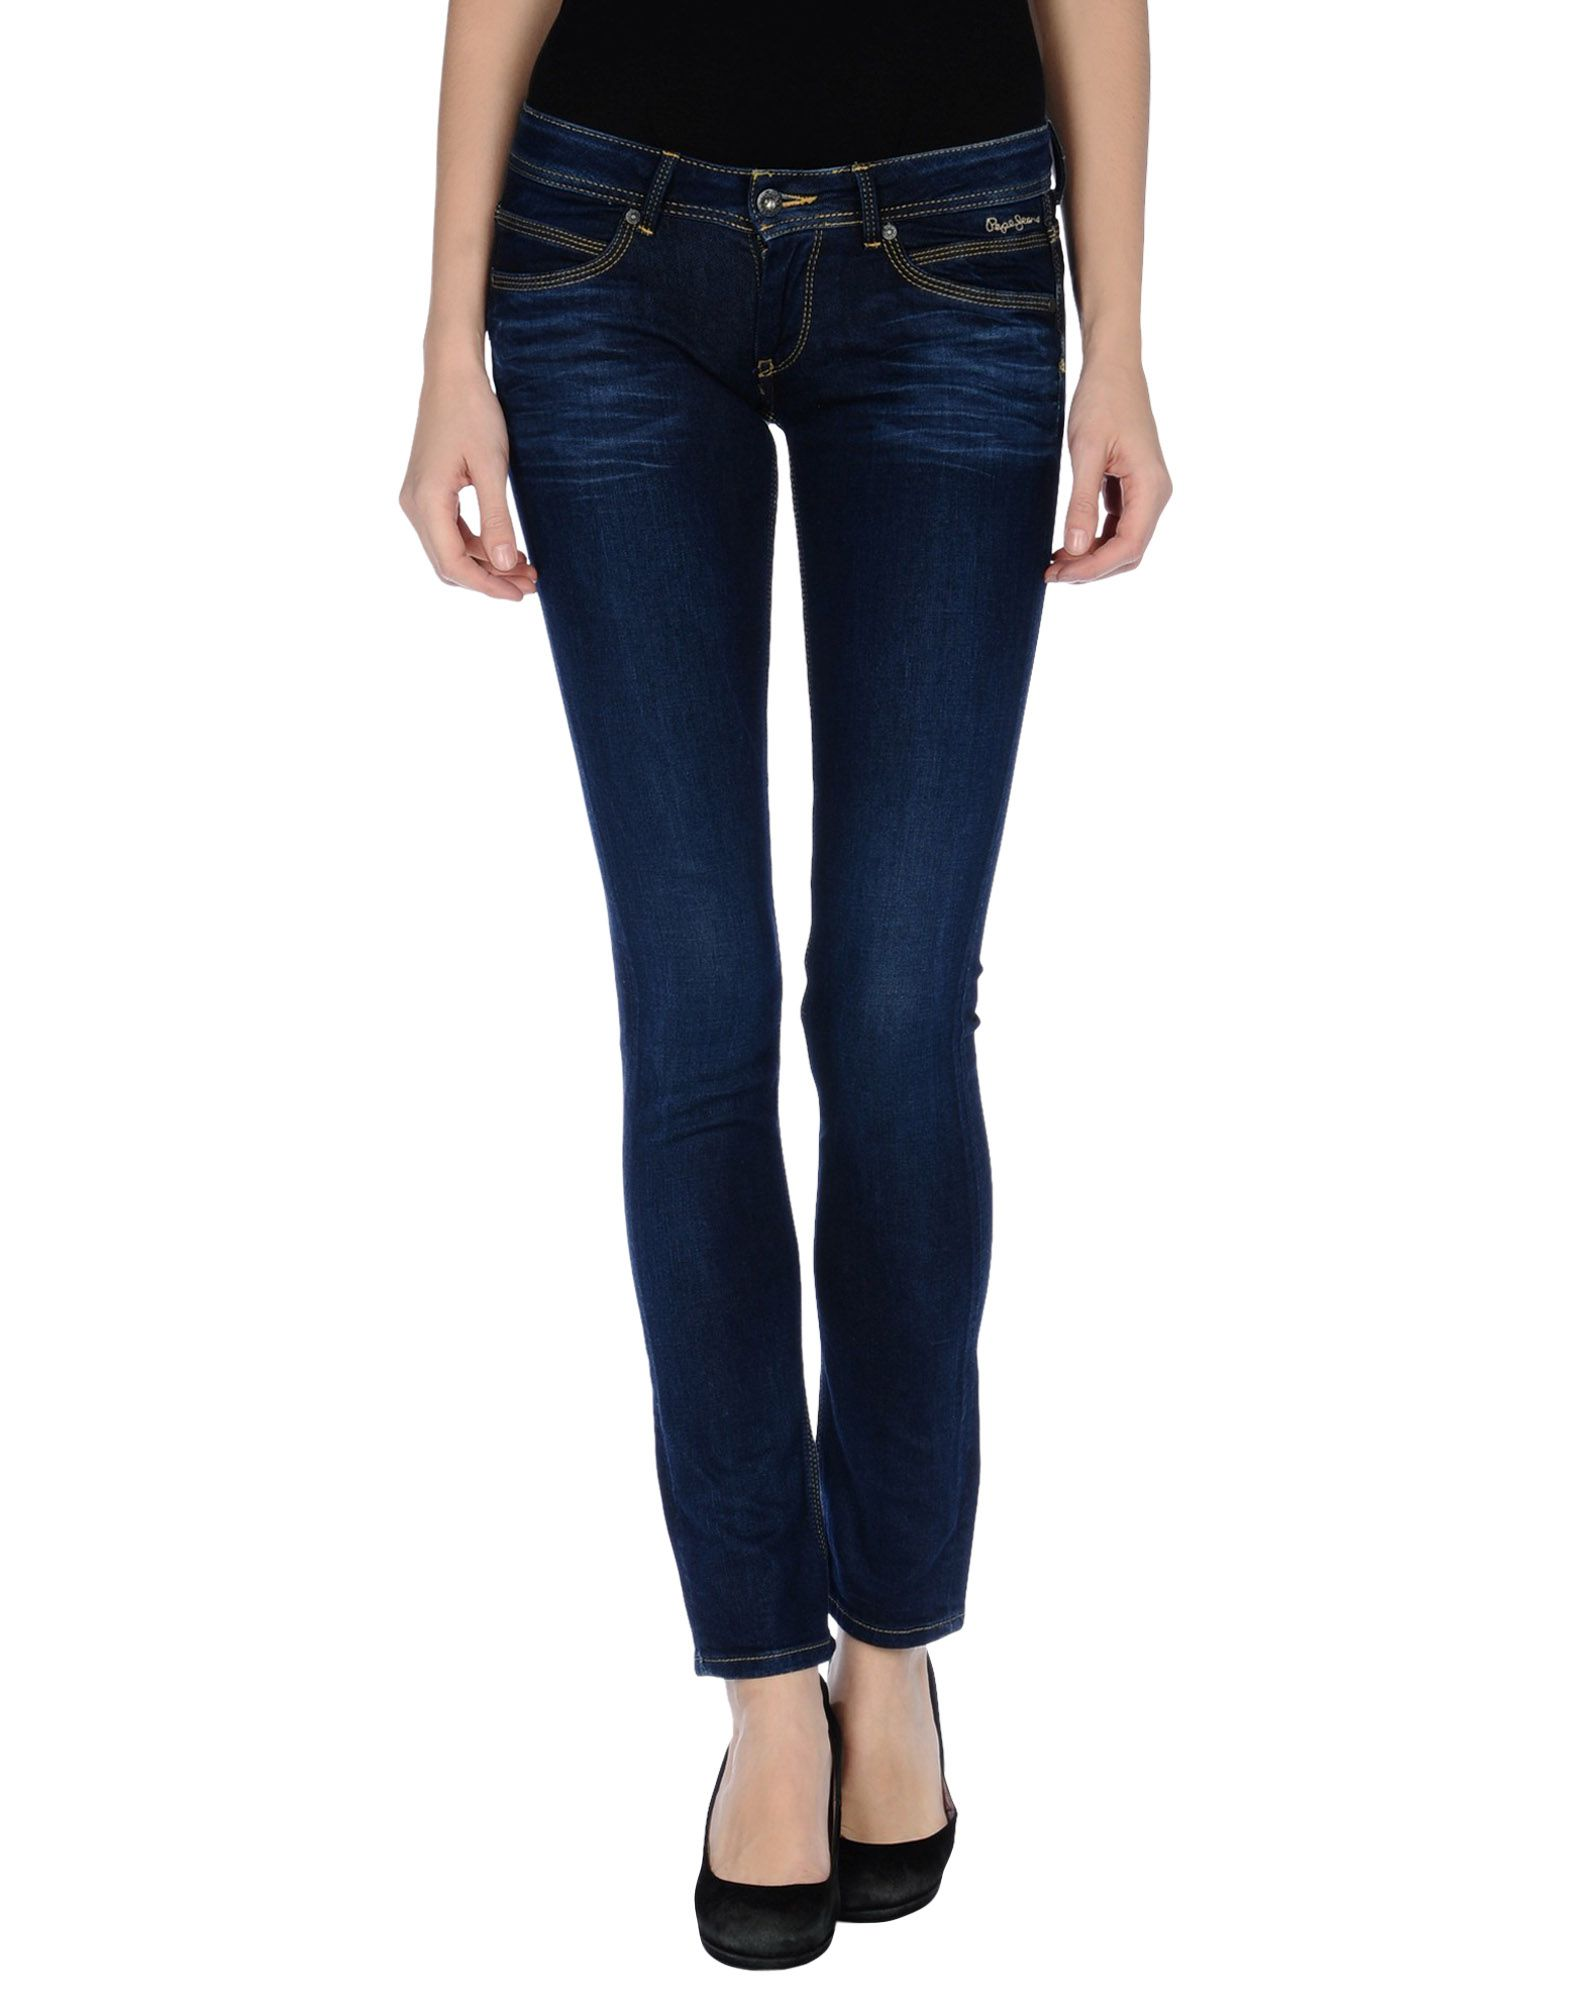 TRU-BLU by PEPE JEANS Джинсовые брюки цена 2017